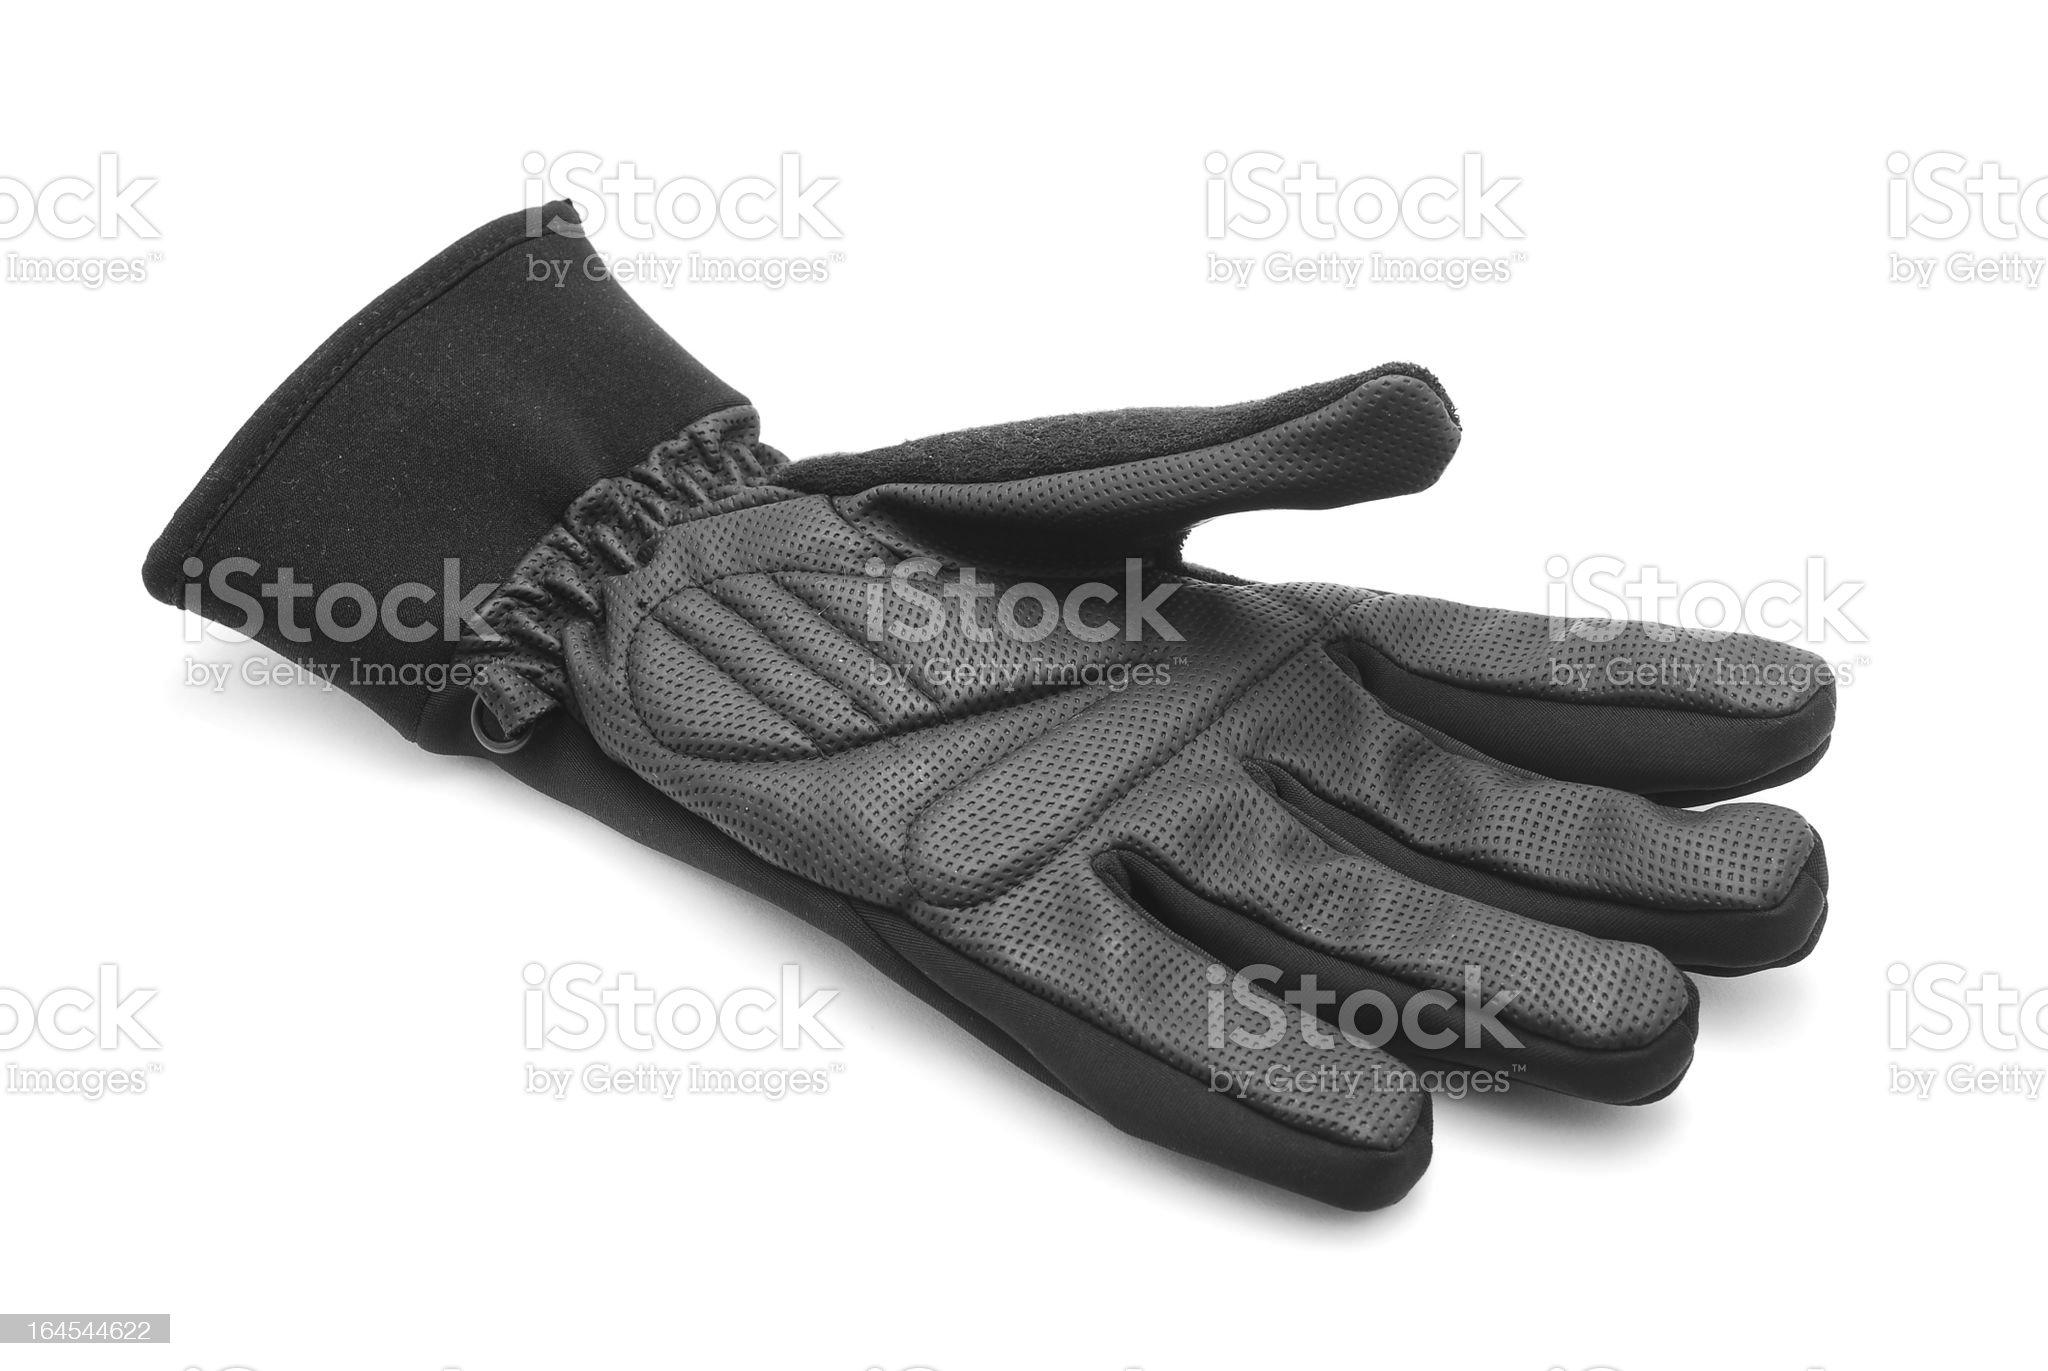 bike glove royalty-free stock photo